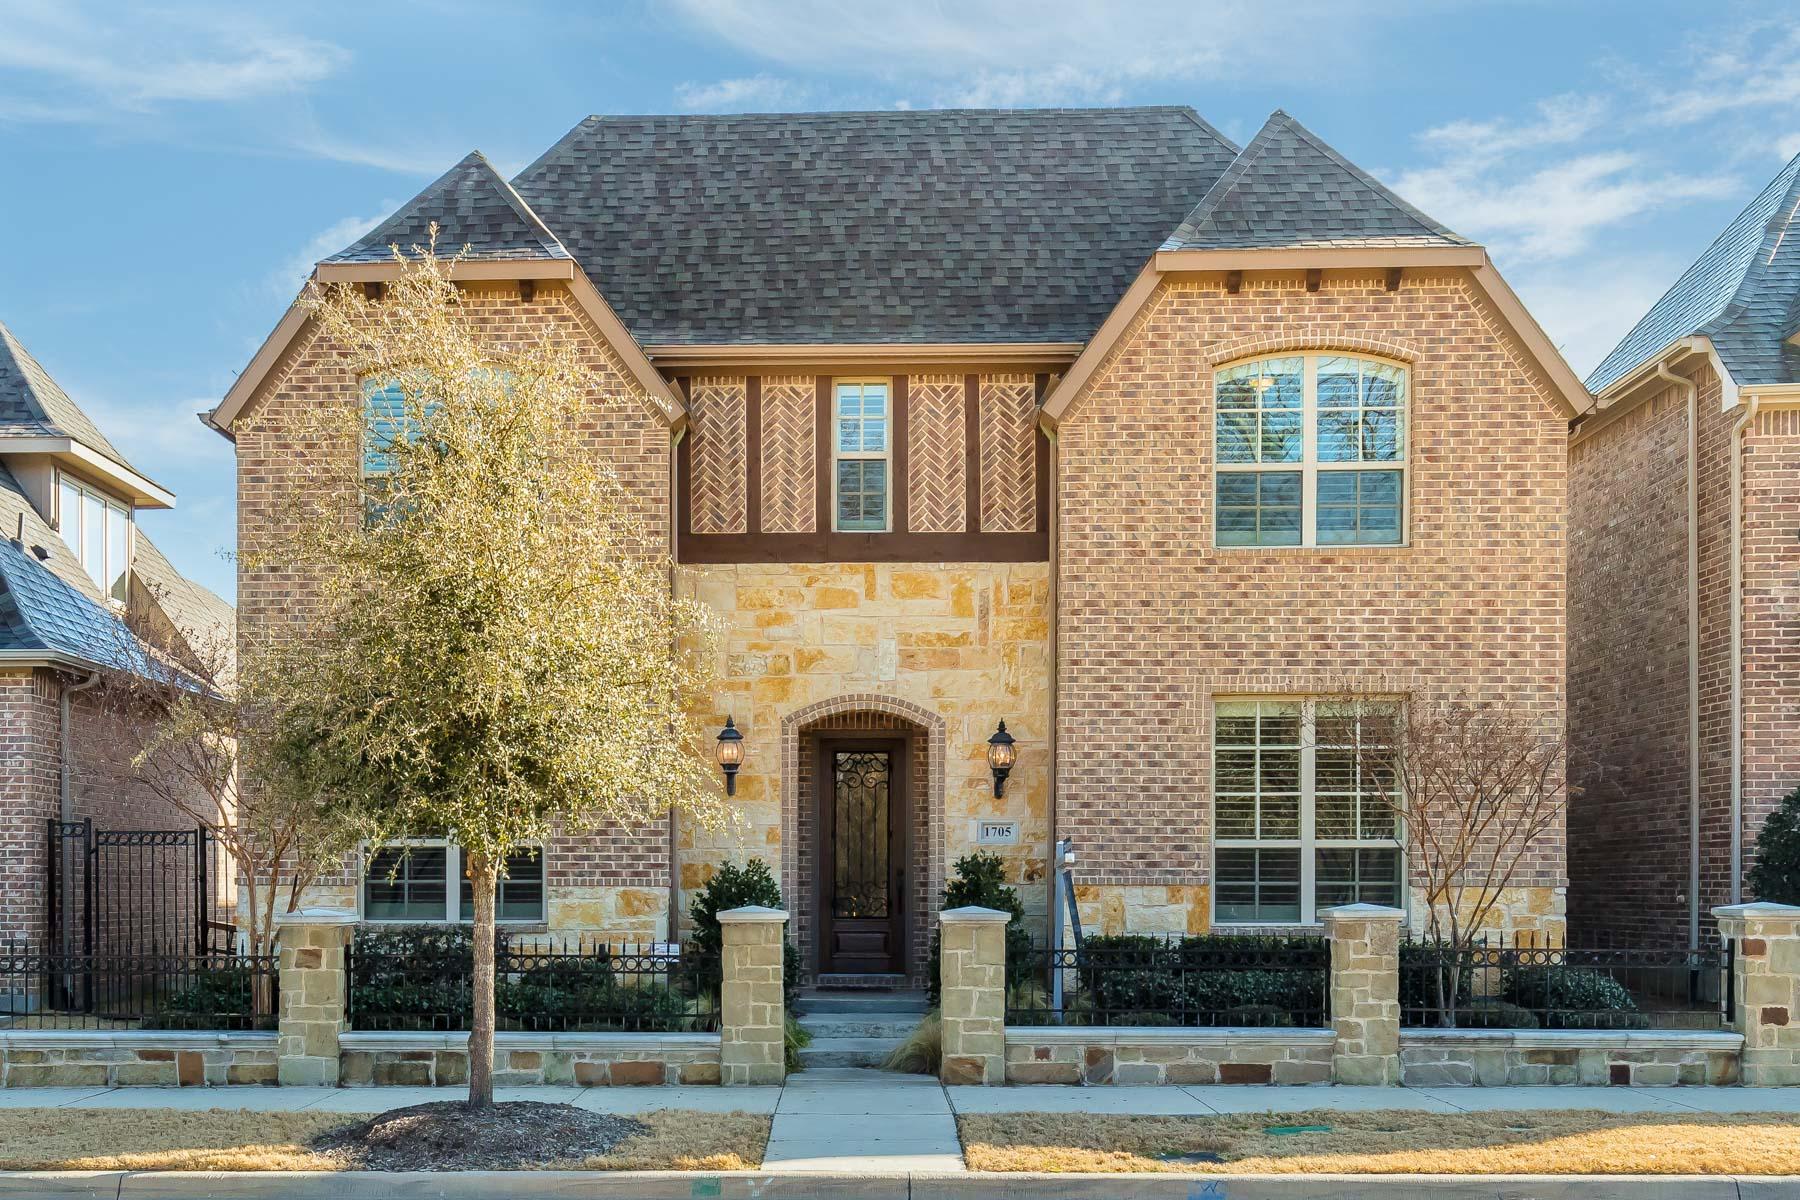 独户住宅 为 销售 在 Upscale, Executive Living in Southlake's Carillon 1705 Riviera Lane, Southlake, 得克萨斯州, 76092 美国